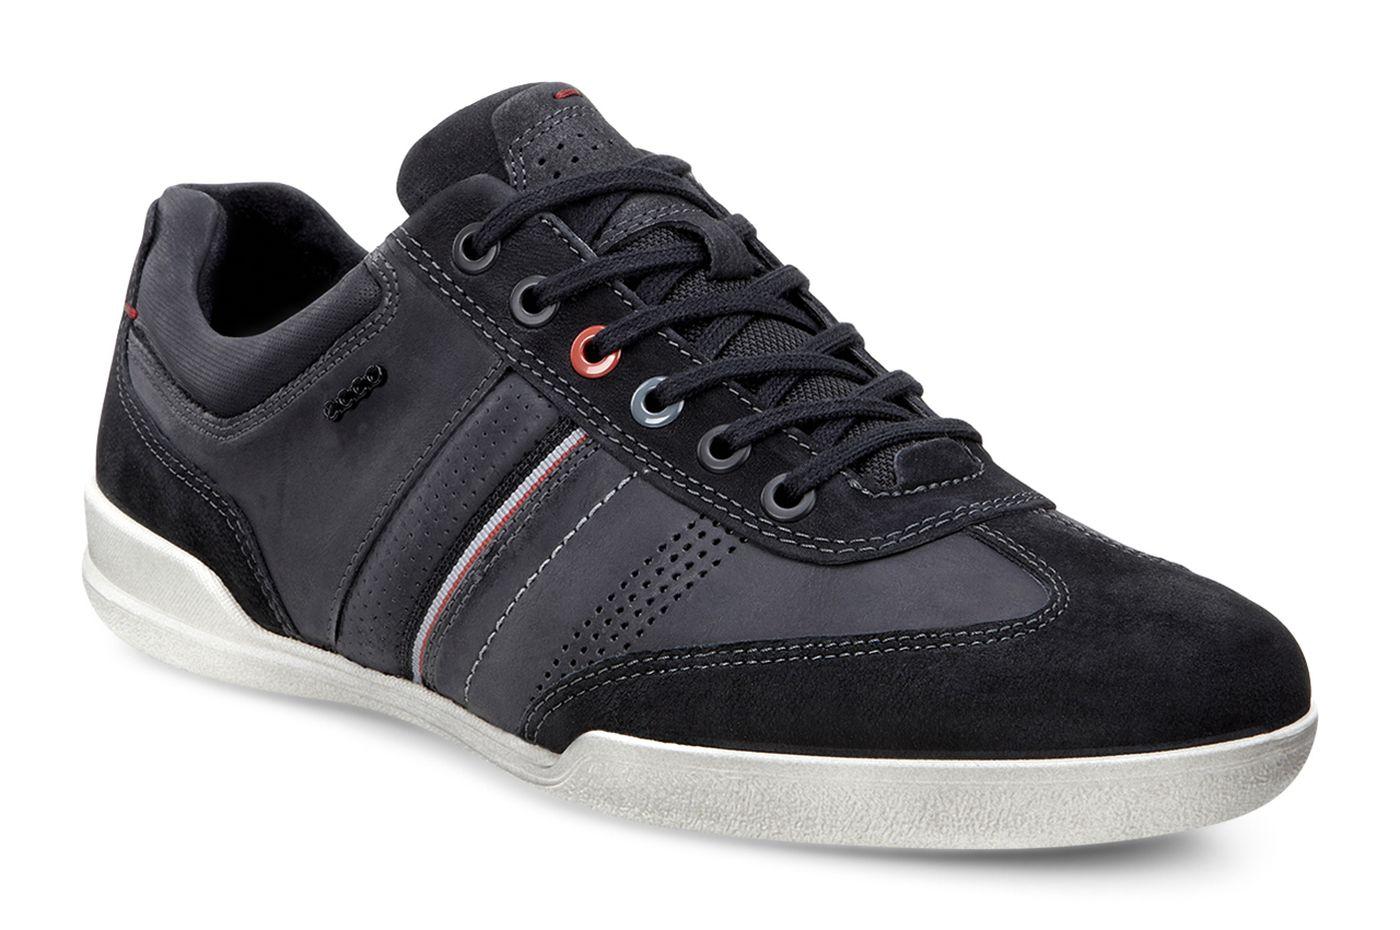 ECCO Enrico Retro Sneaker | Retro